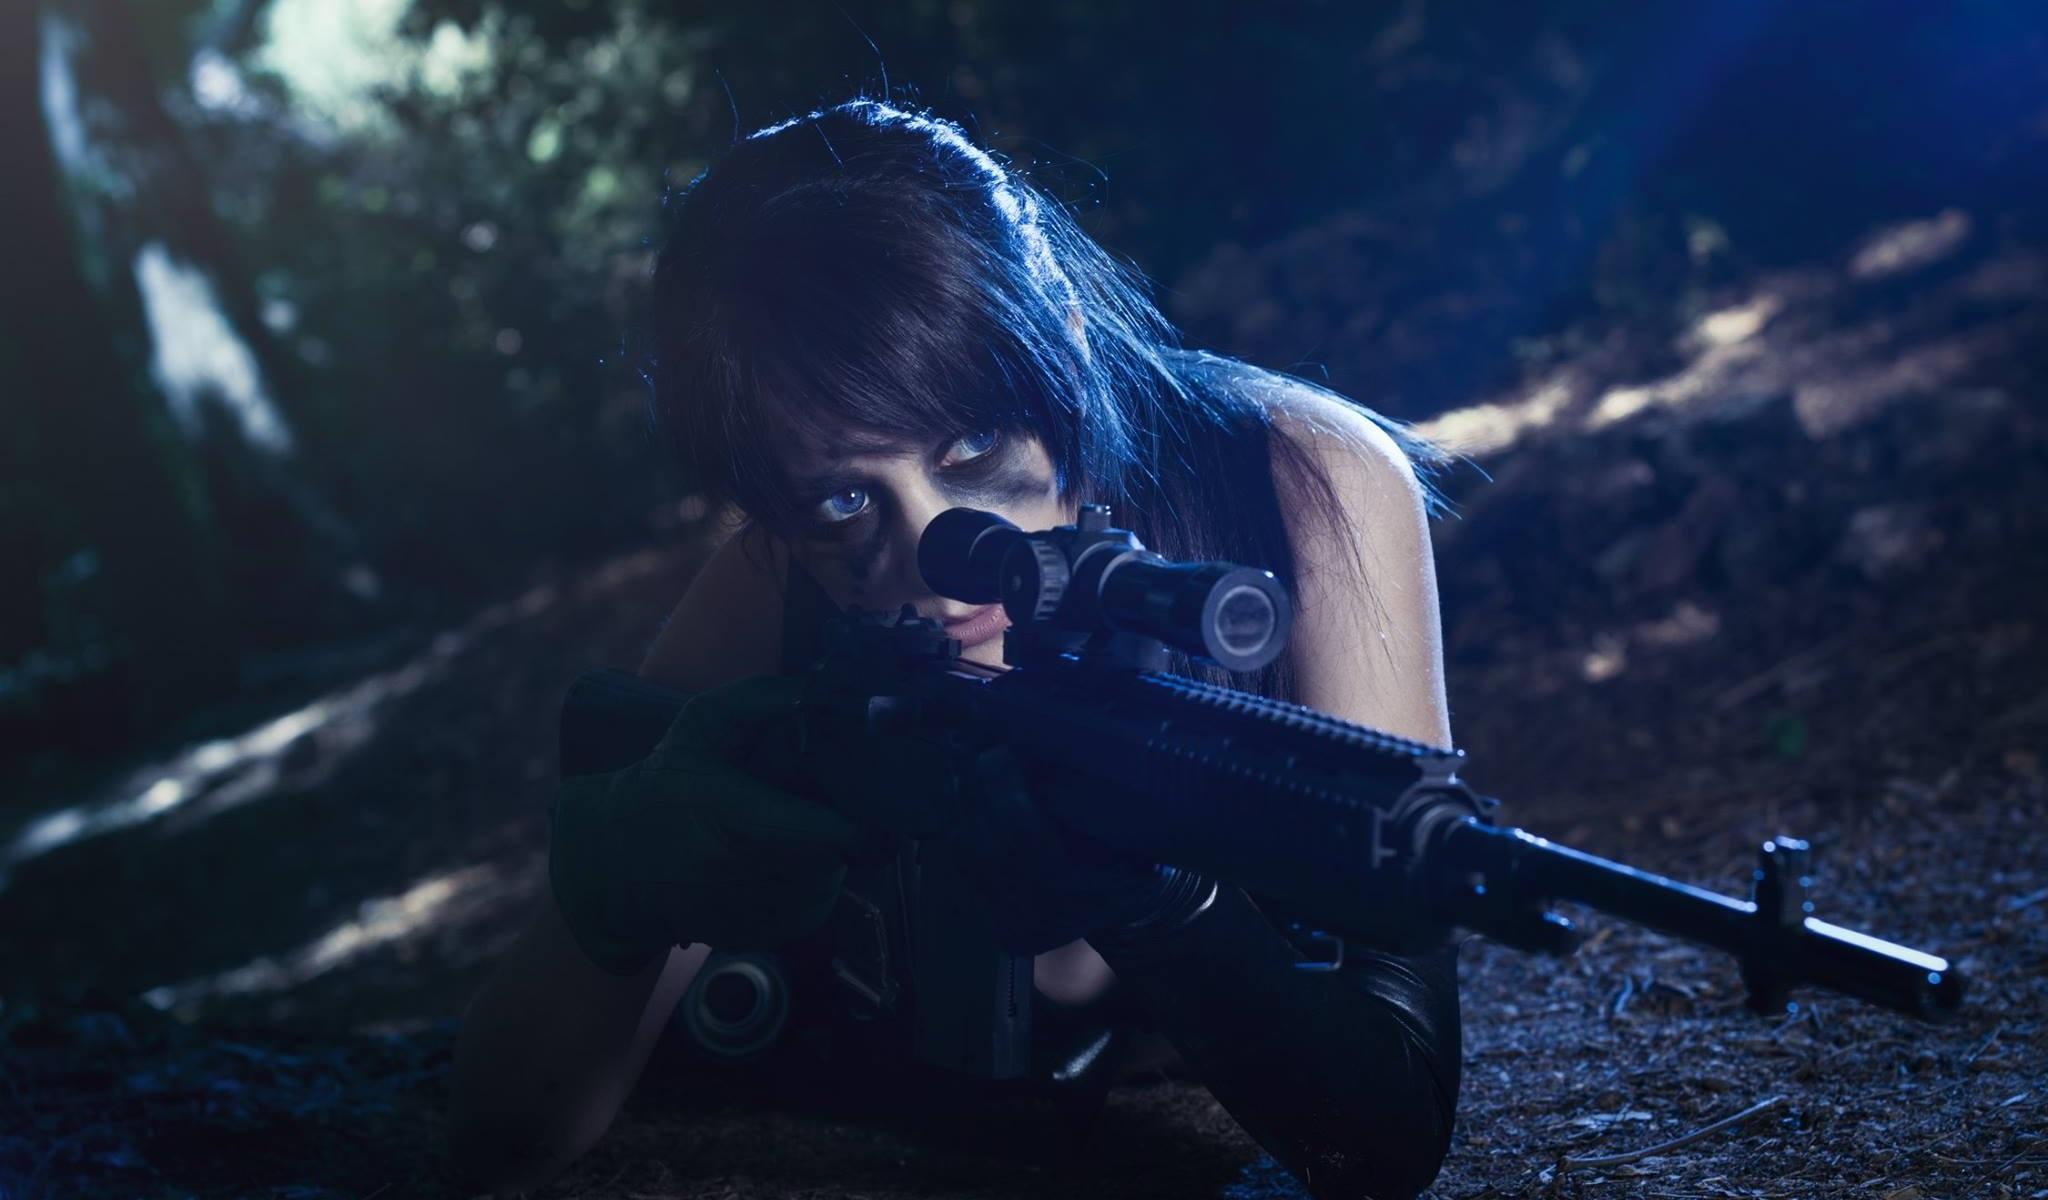 12 Quiet Metal Gear Solid Hd Wallpapers Background